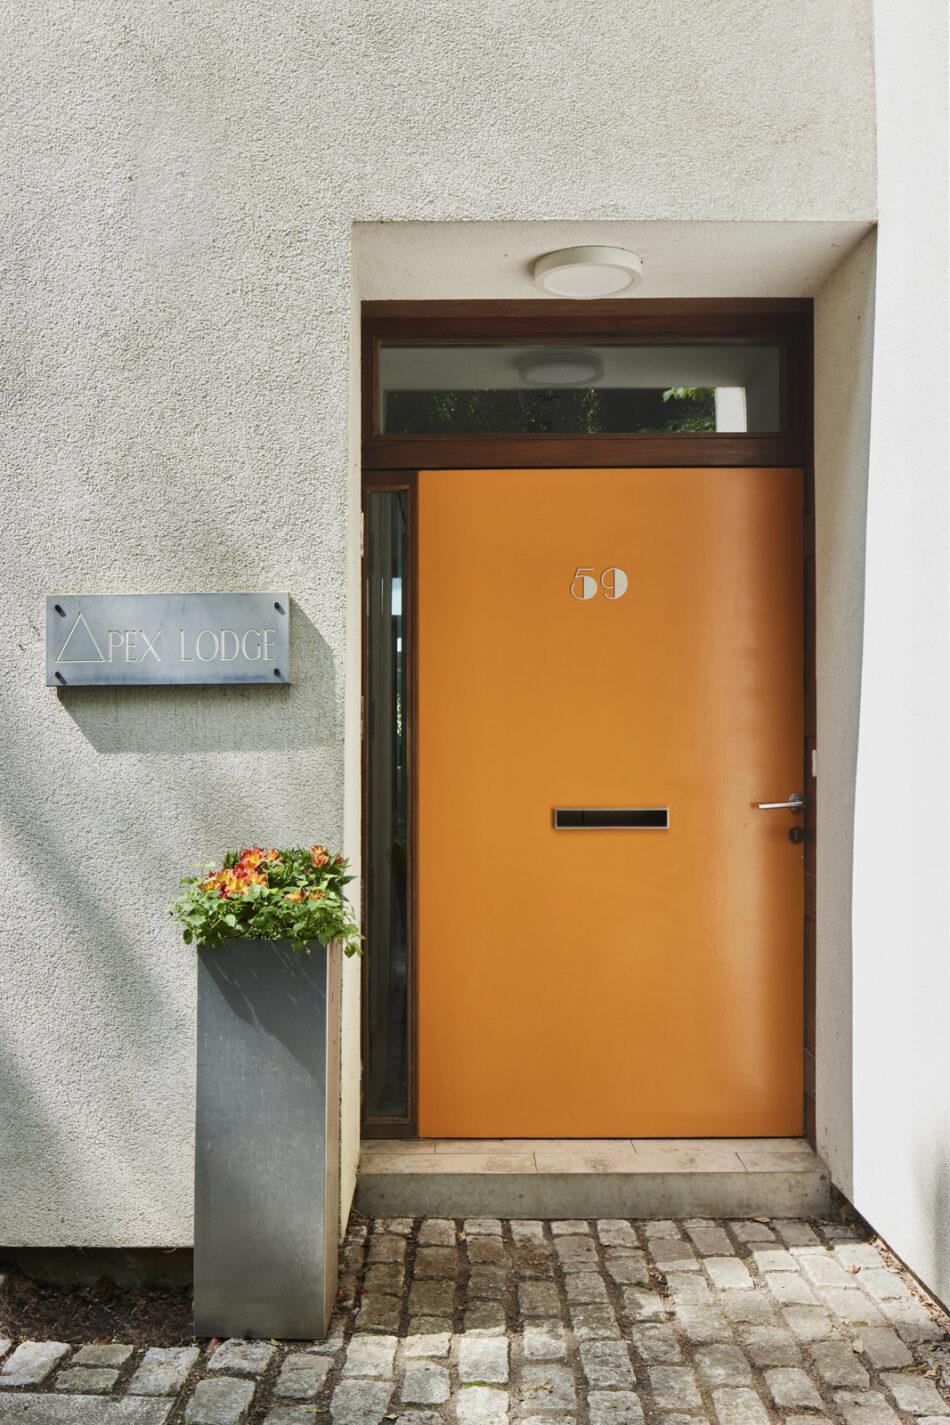 Apex-Lodge-Fitzroy-Park-London-N6-33-950x1425.jpg